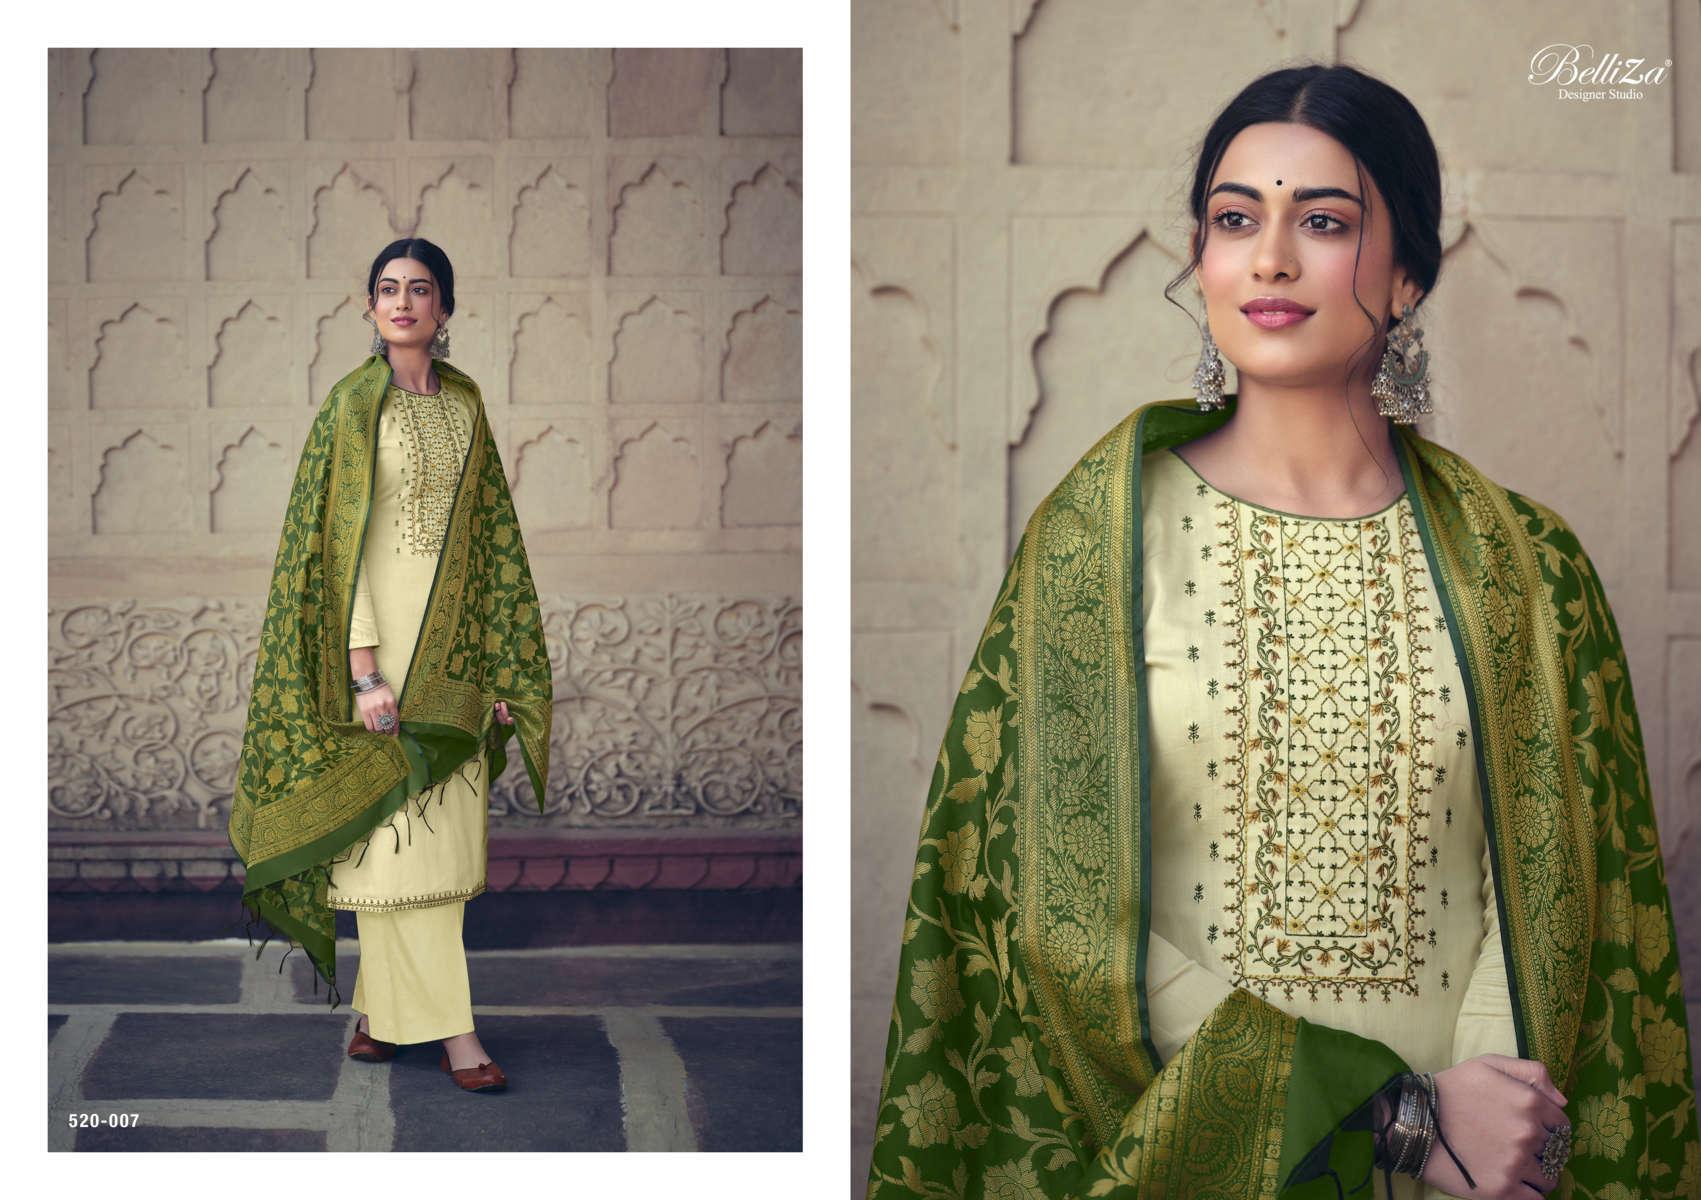 Belliza Shamia Salwar Suit Wholesale Catalog 8 Pcs 8 - Belliza Shamia Salwar Suit Wholesale Catalog 8 Pcs